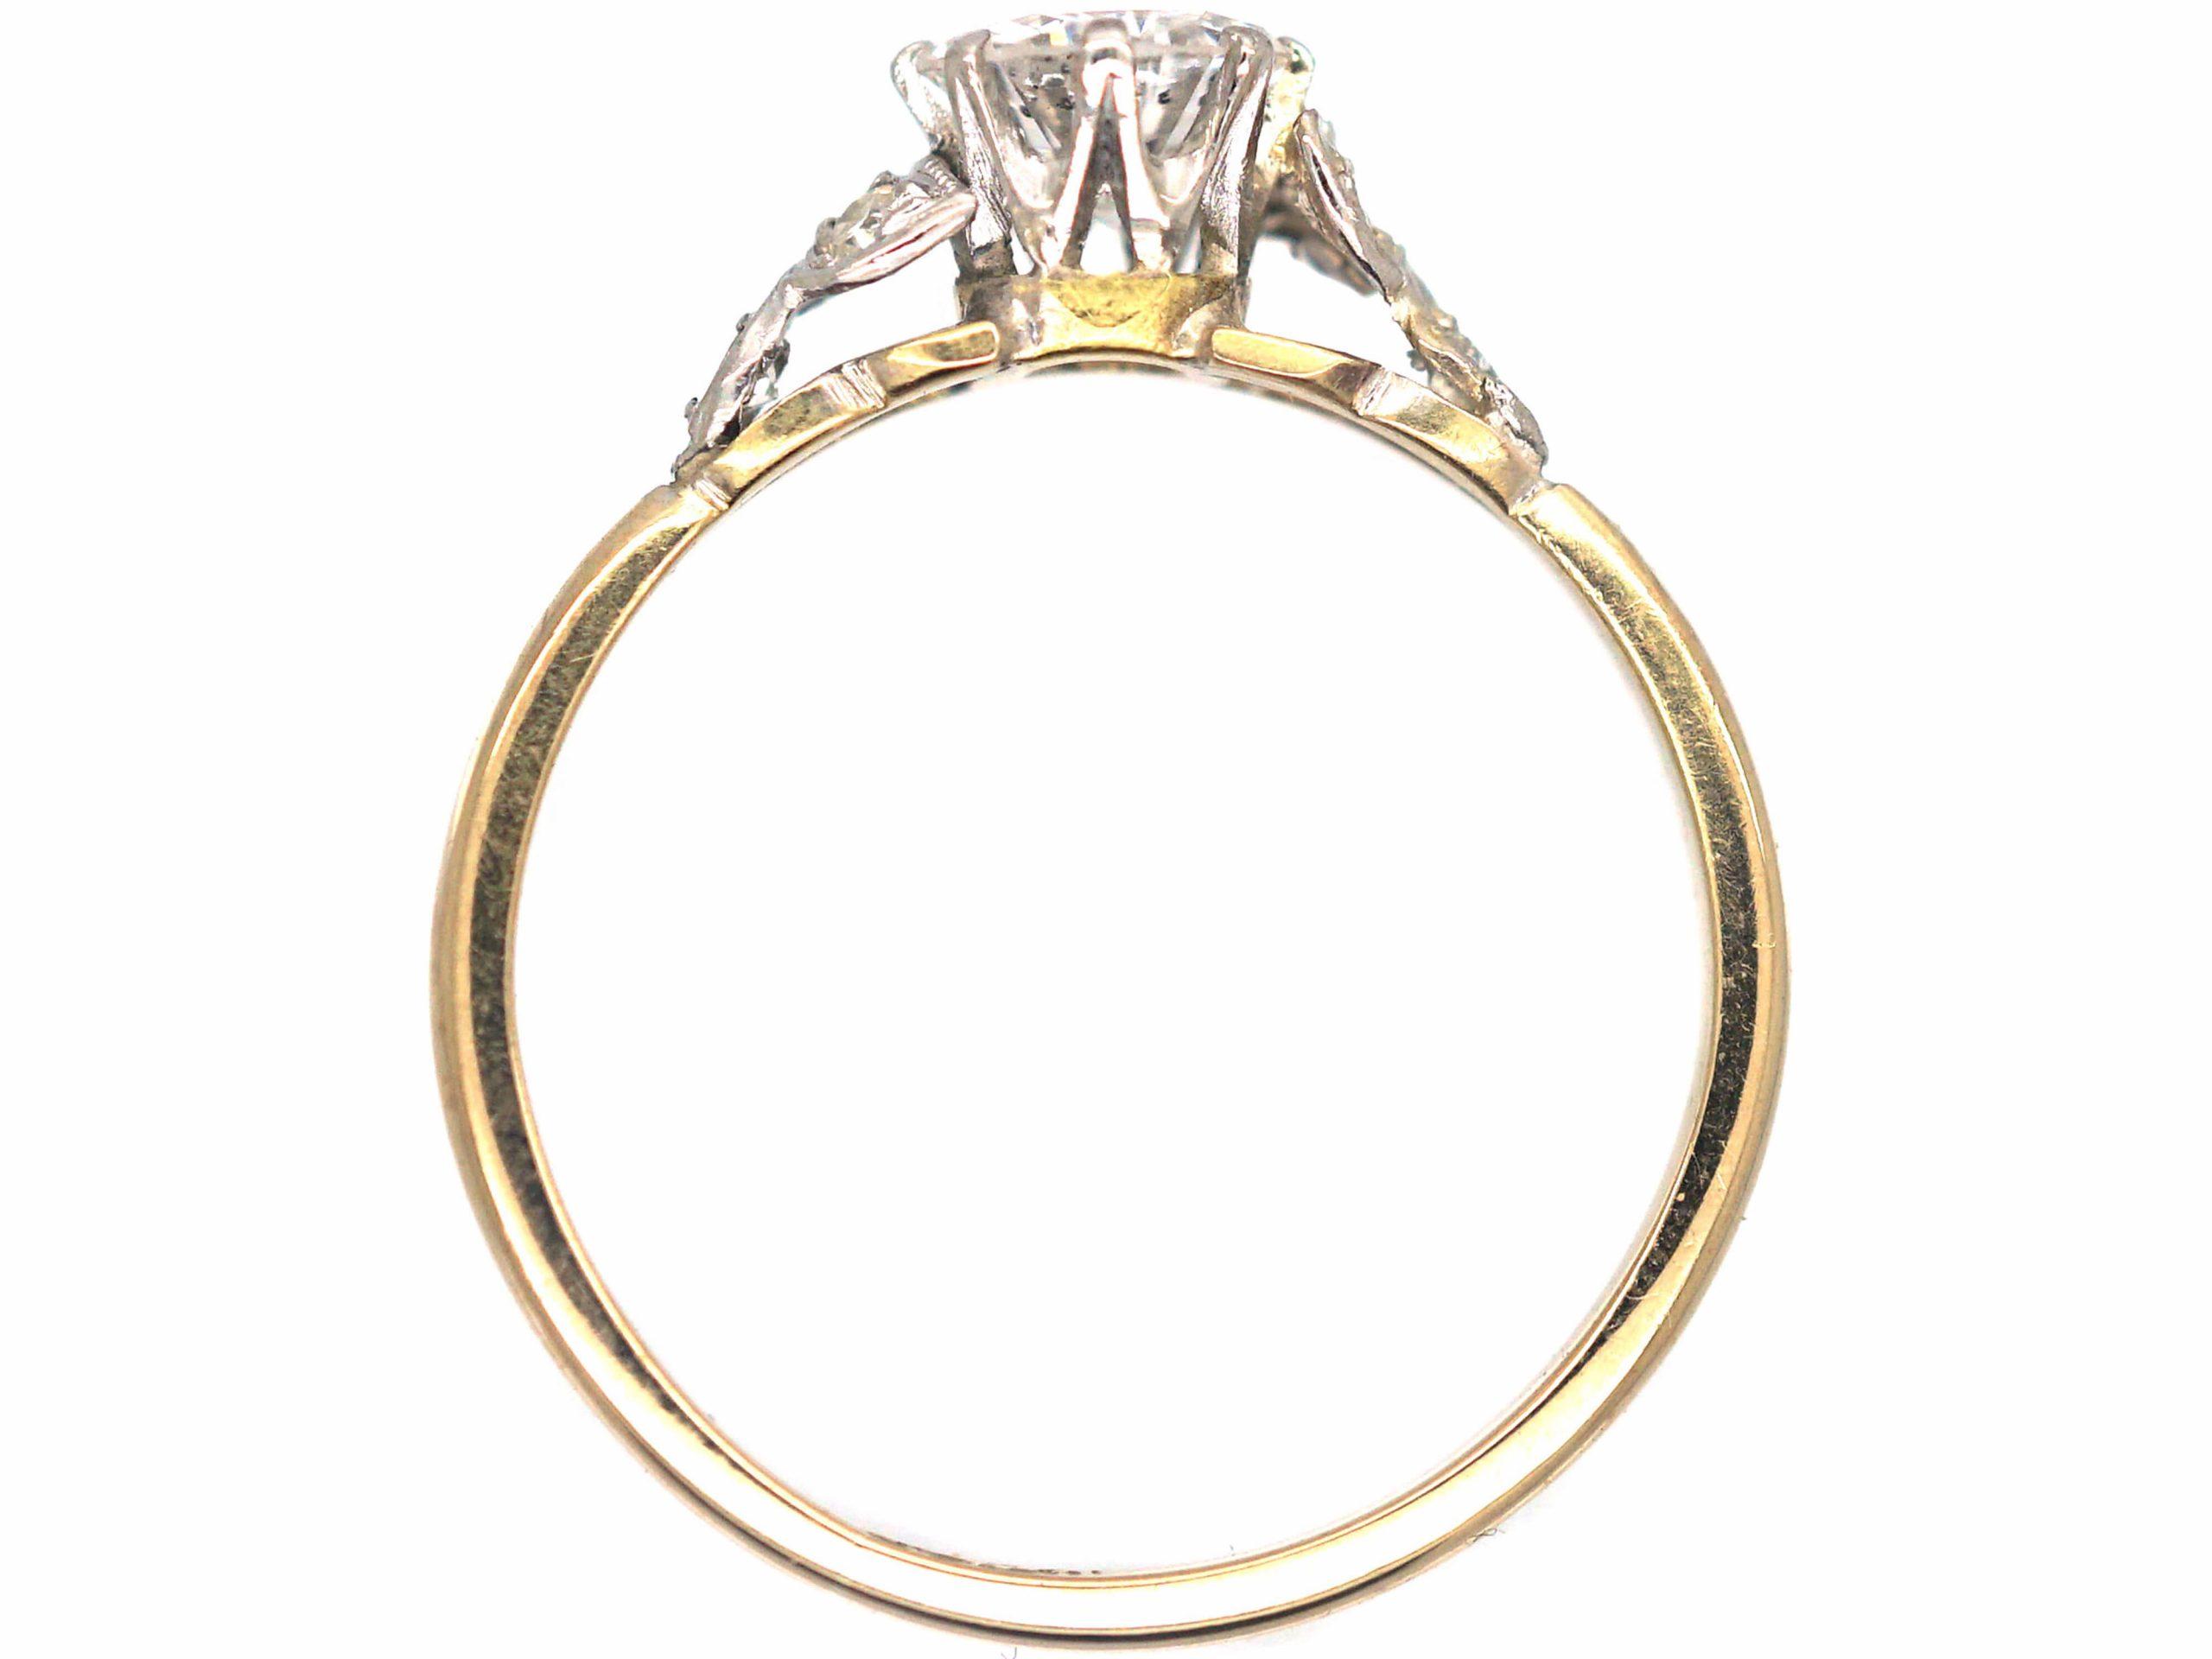 Art Deco 18ct Gold & Platinum, Diamond Solitaire Ring with Diamond Set Leaf Shoulders